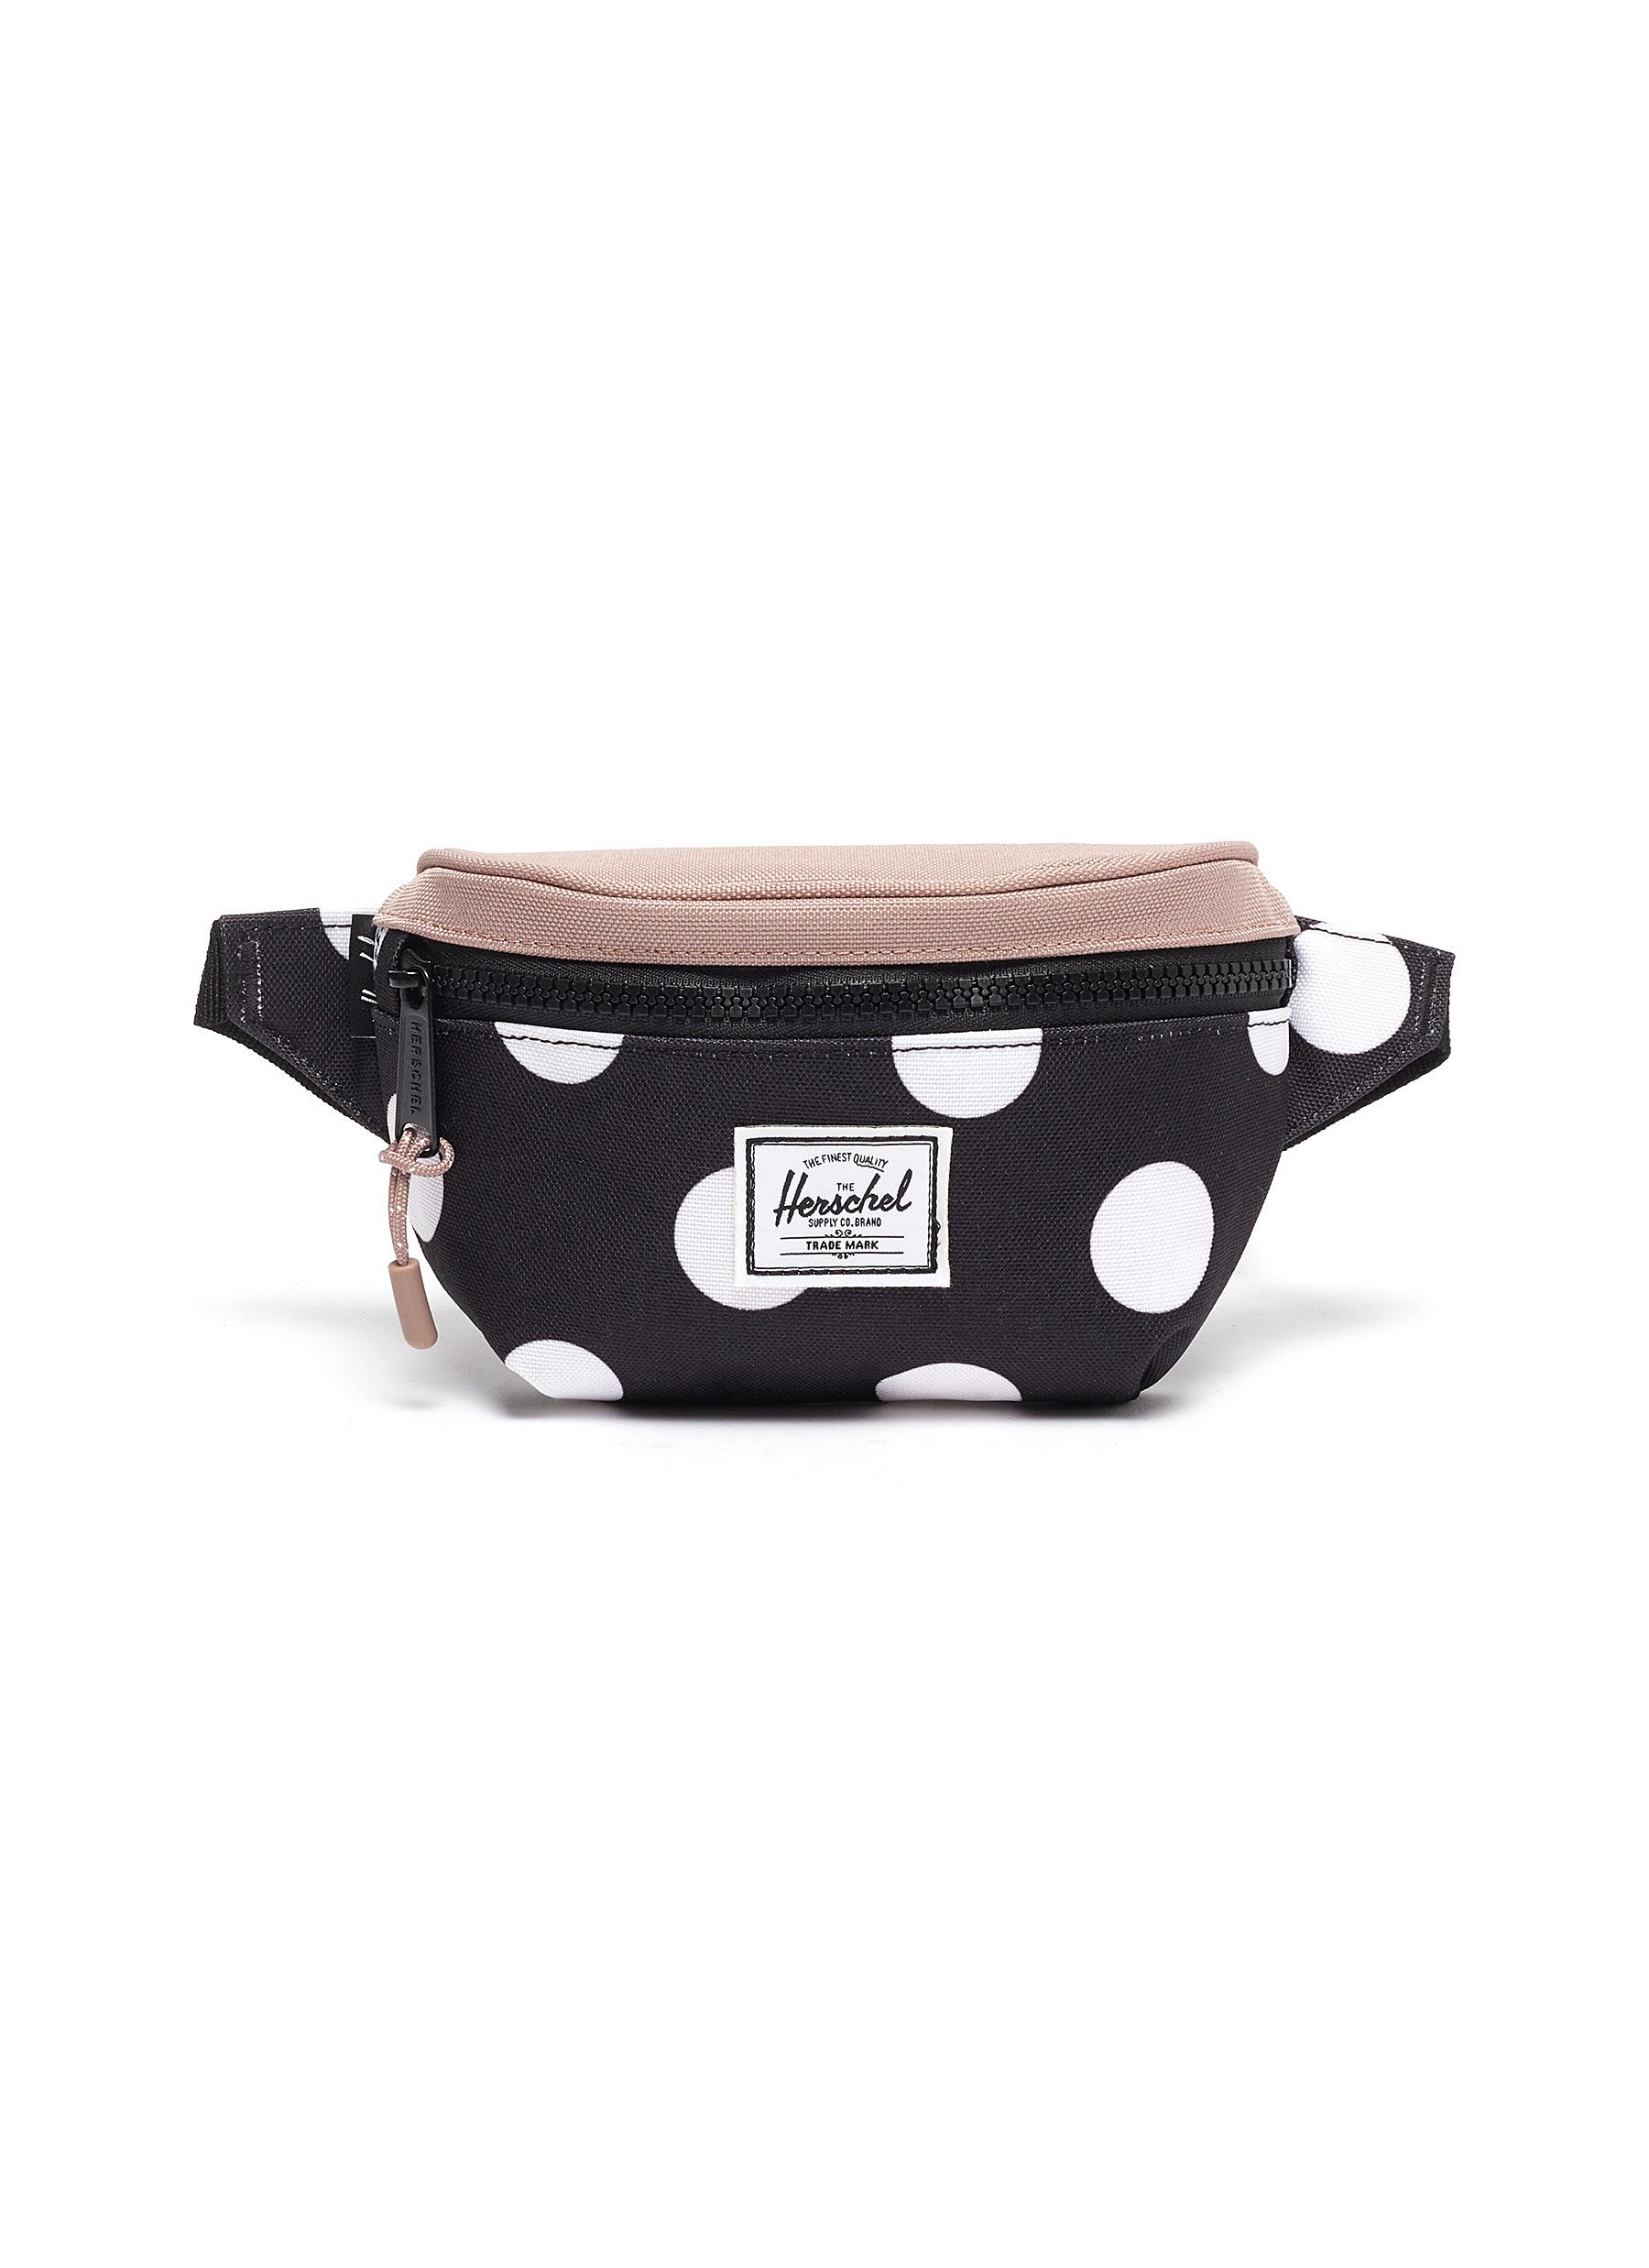 "Twelve' Polka Dot Print Contrast Panel Kids Canvas Belt Bag"" - THE HERSCHEL SUPPLY CO. - Modalova"